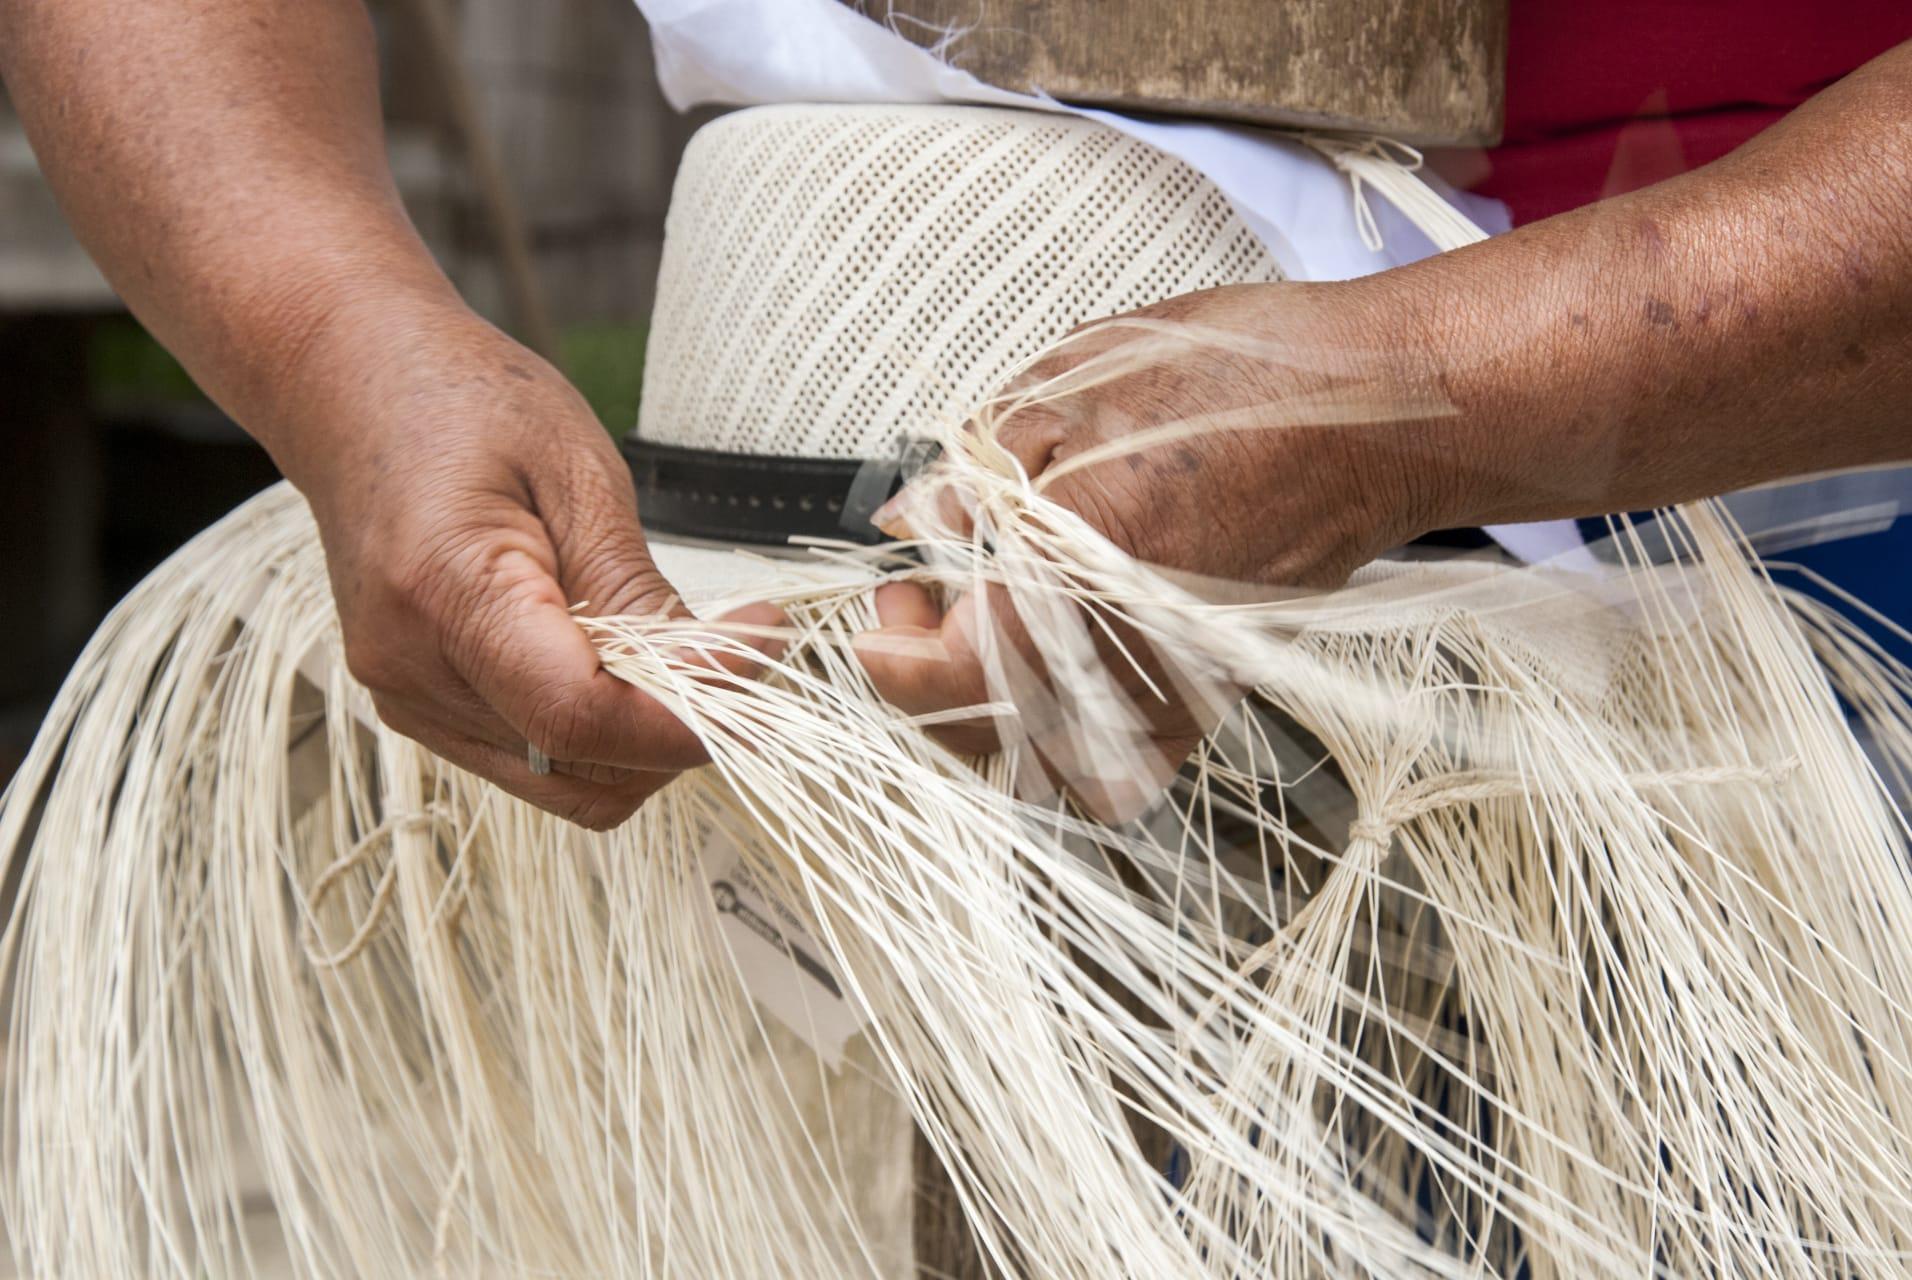 Pasto - Culture, Tradition and Handicrafts in Sandona Nariño